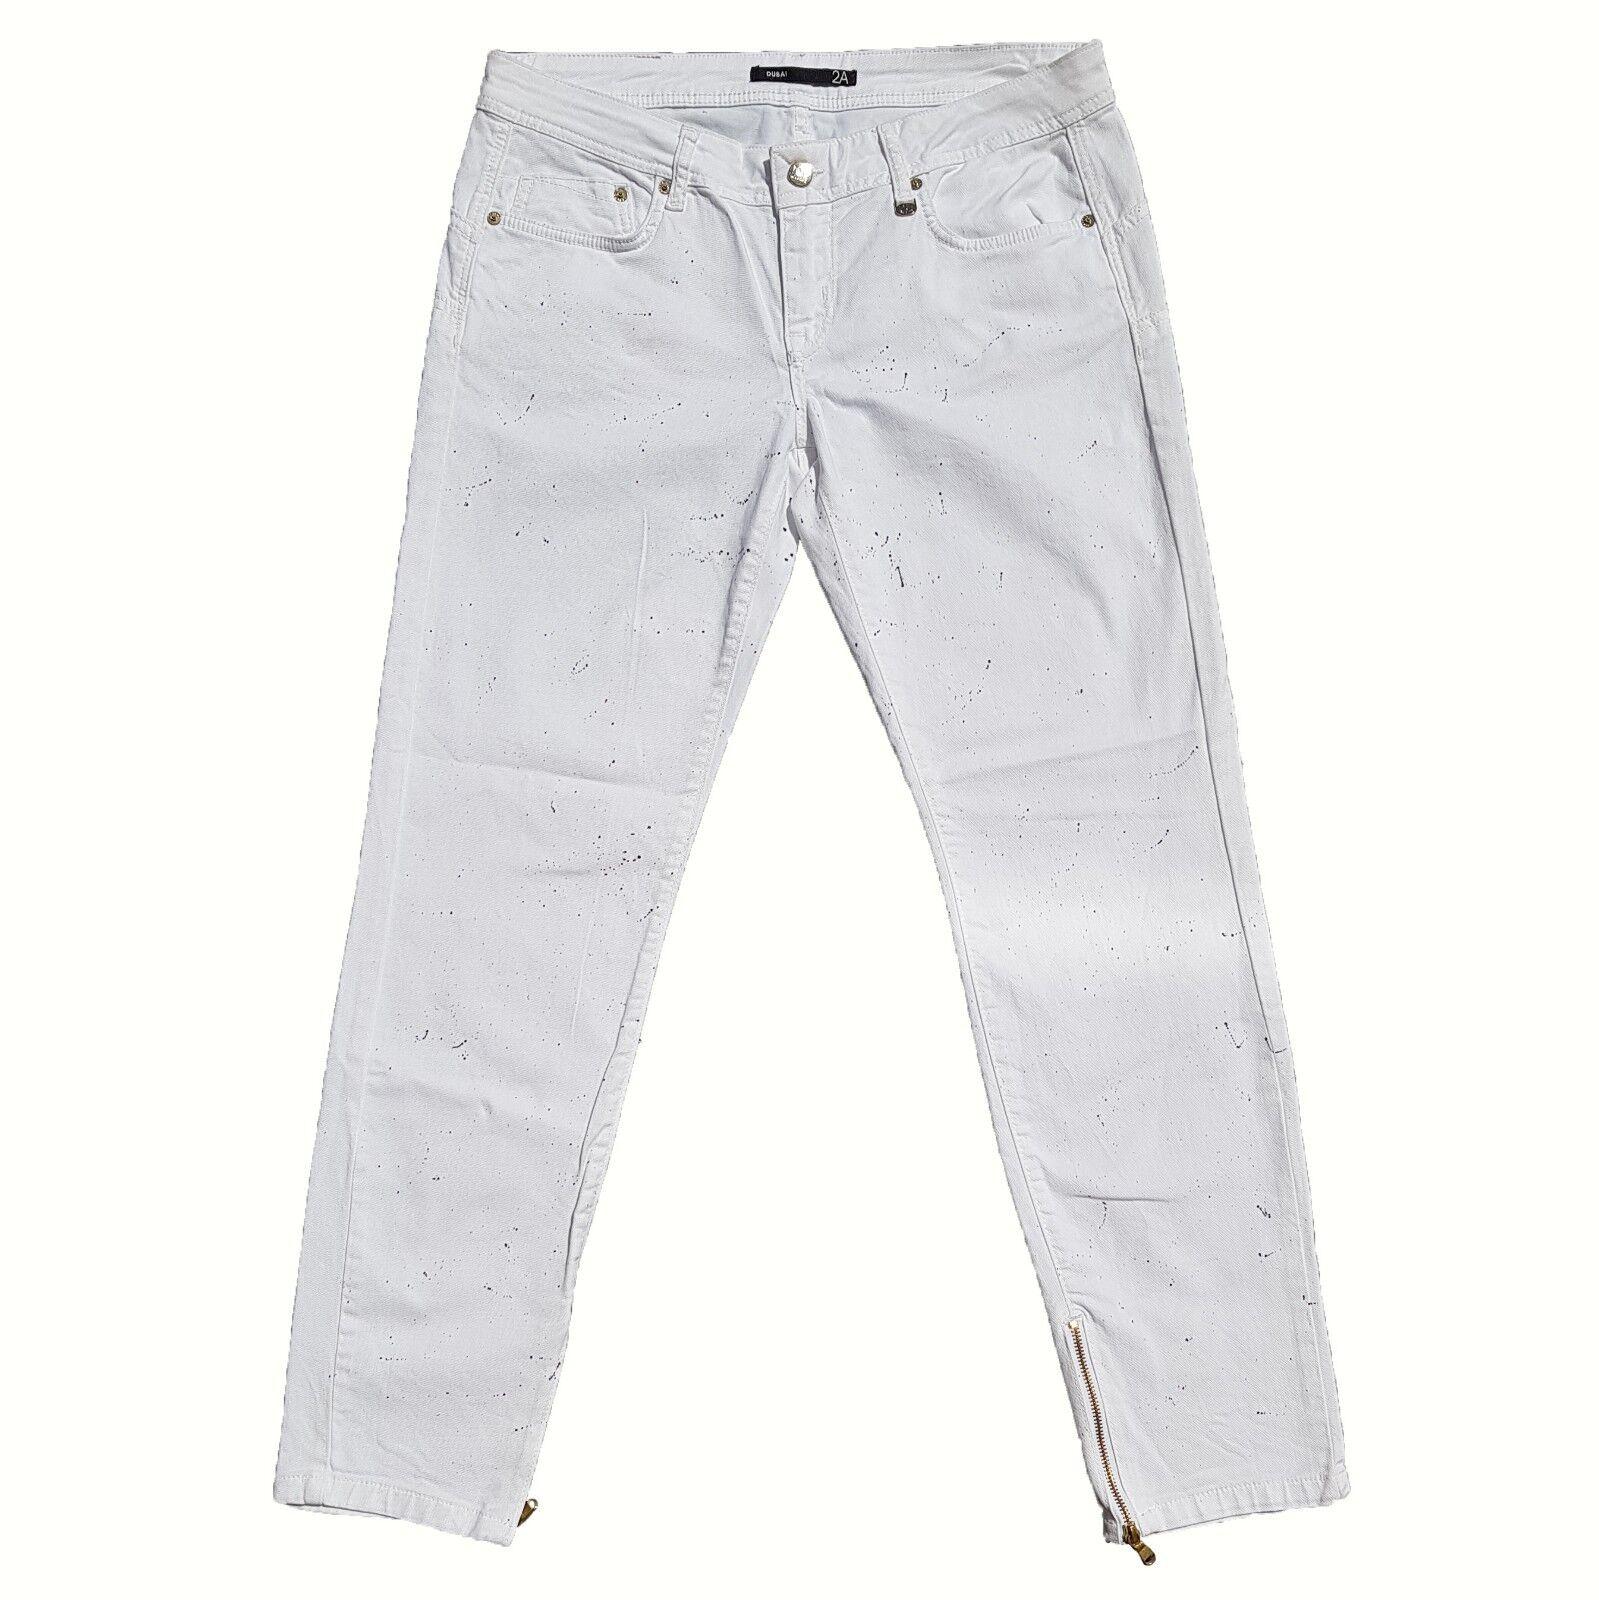 New Iceberg Dubai 2A  Ladies Jeans Paint Splattered Size 33 White